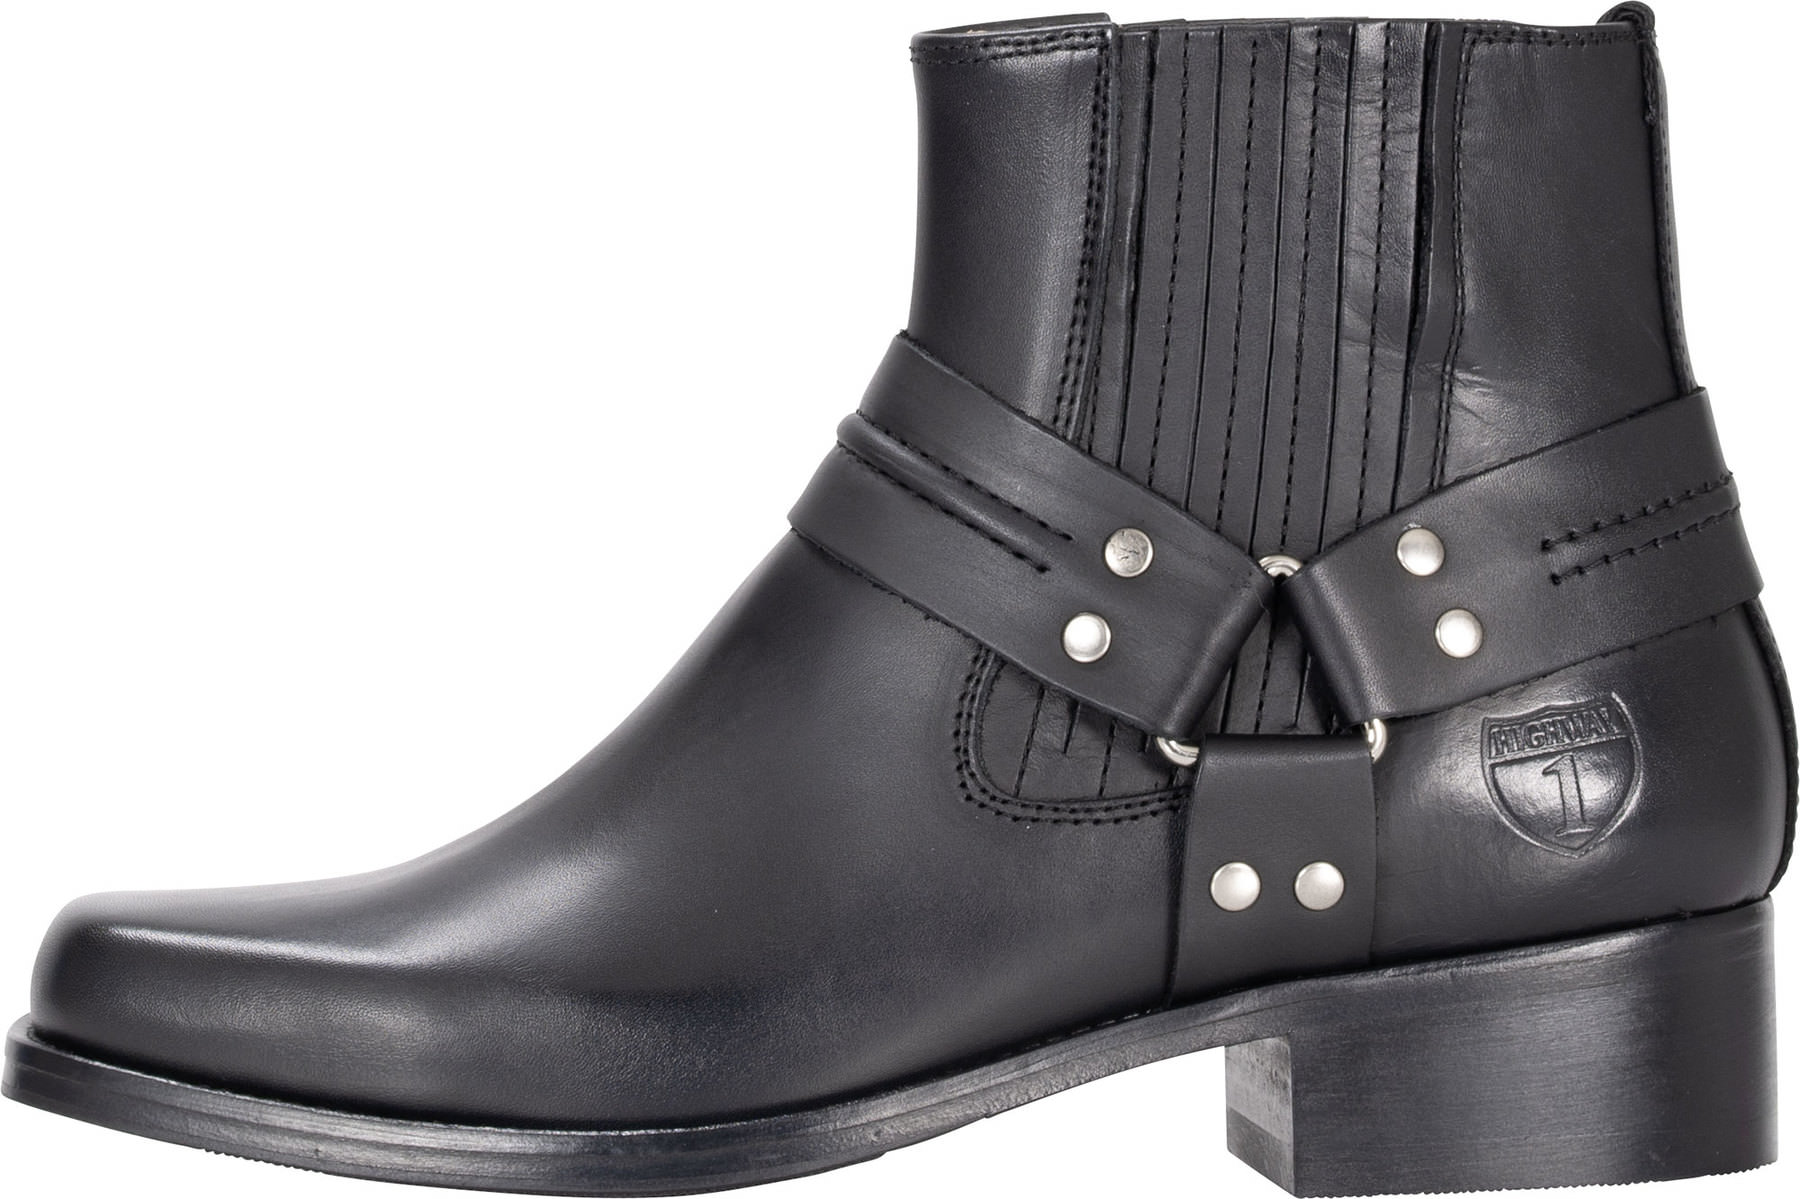 Buy Highway 1 Western boots | Louis